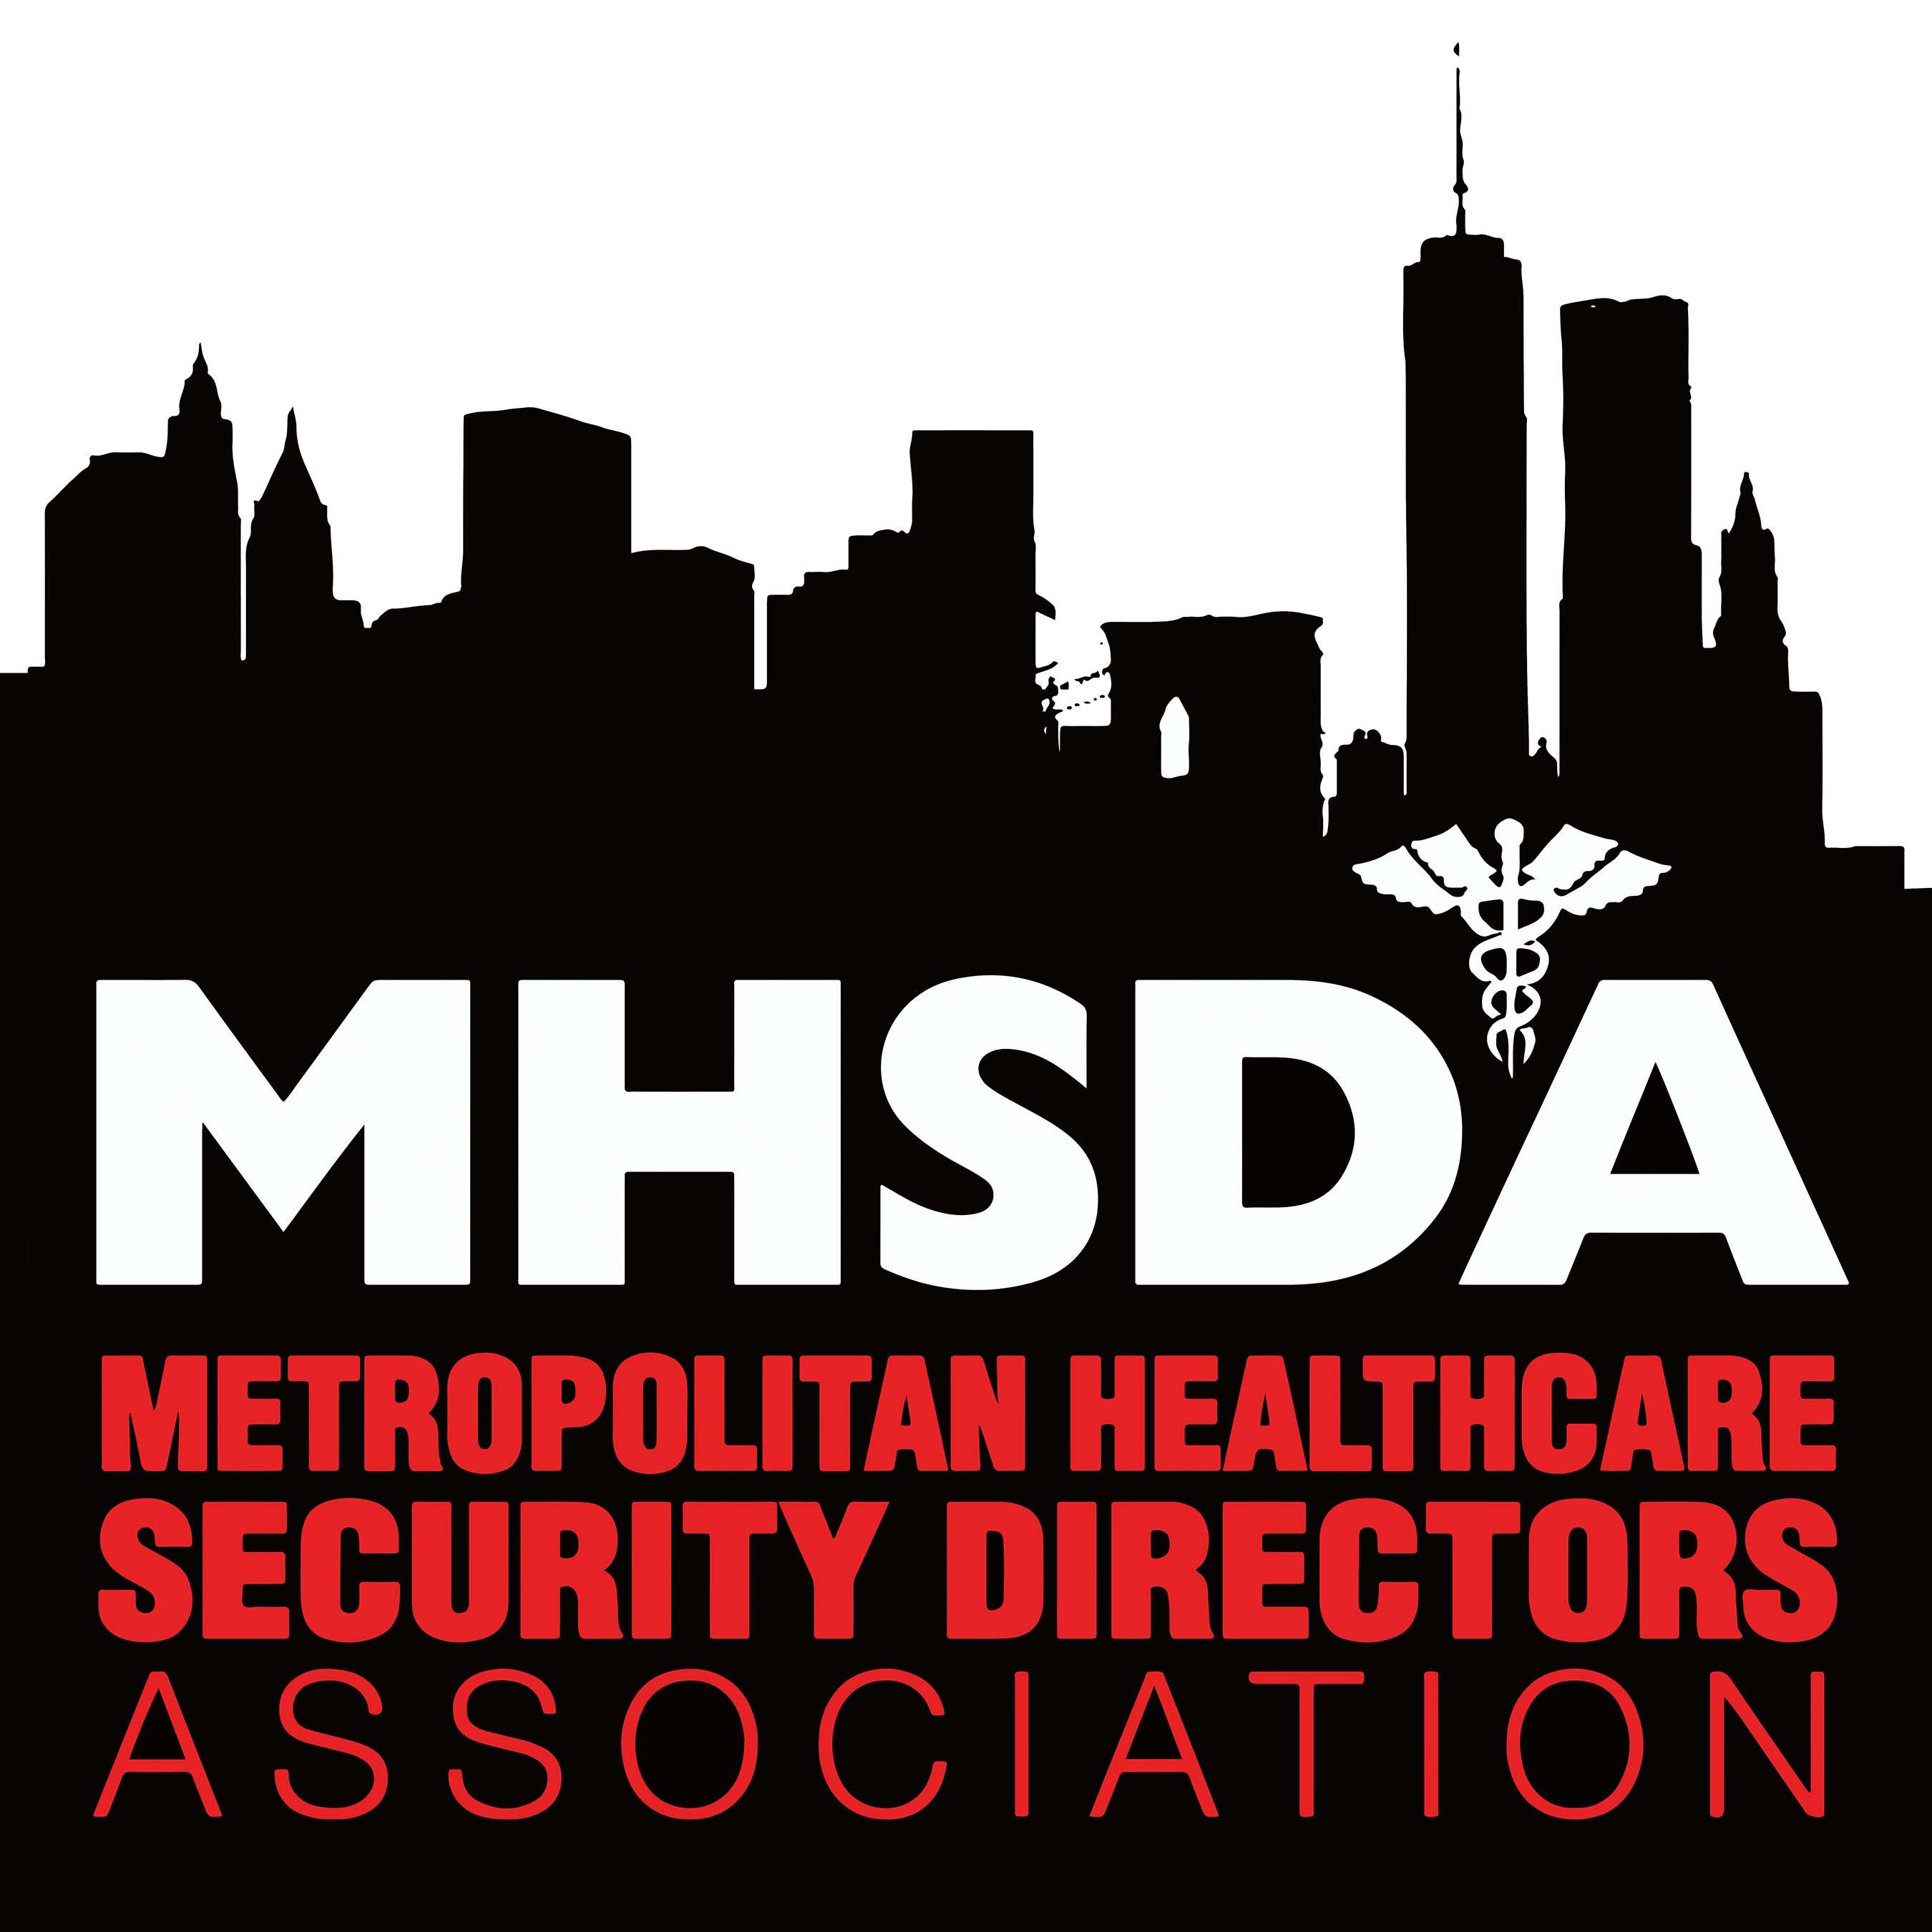 MHSDA logo